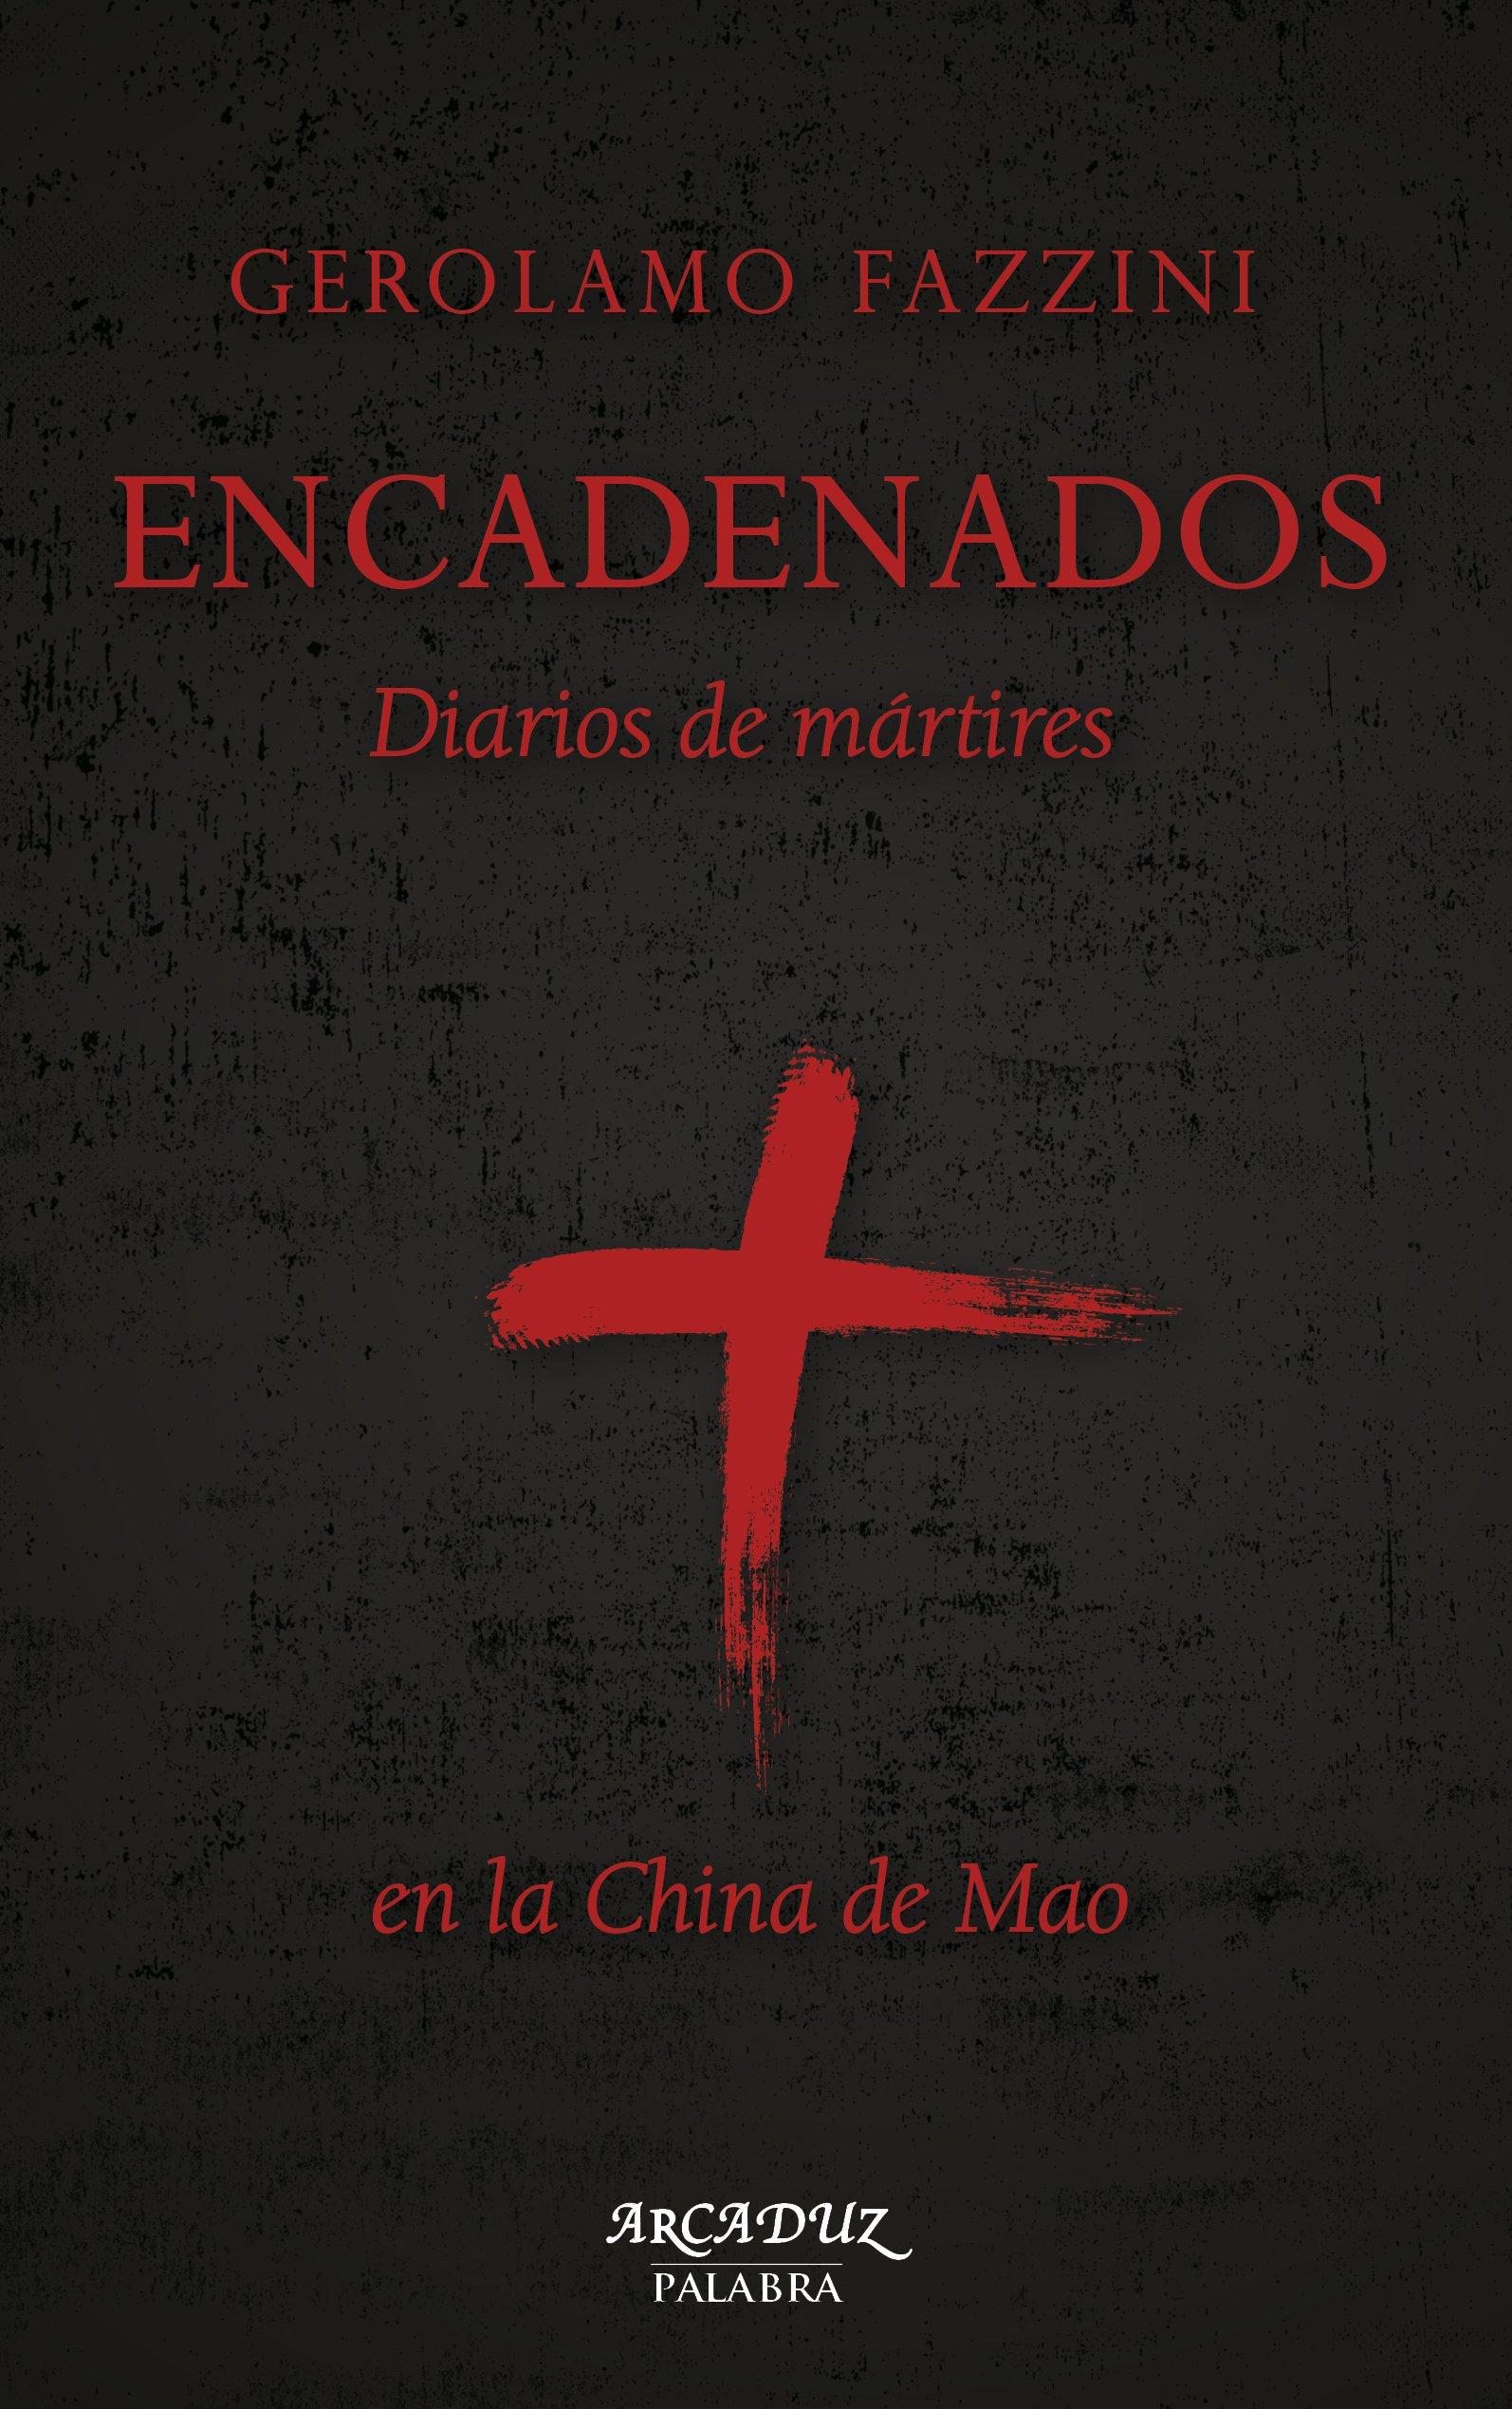 Encadenados (Arcaduz nº 123): Amazon.es: Fazzini, Gerolamo, Ostos García, Raúl, Pérez Arangüena, José Ramón: Libros